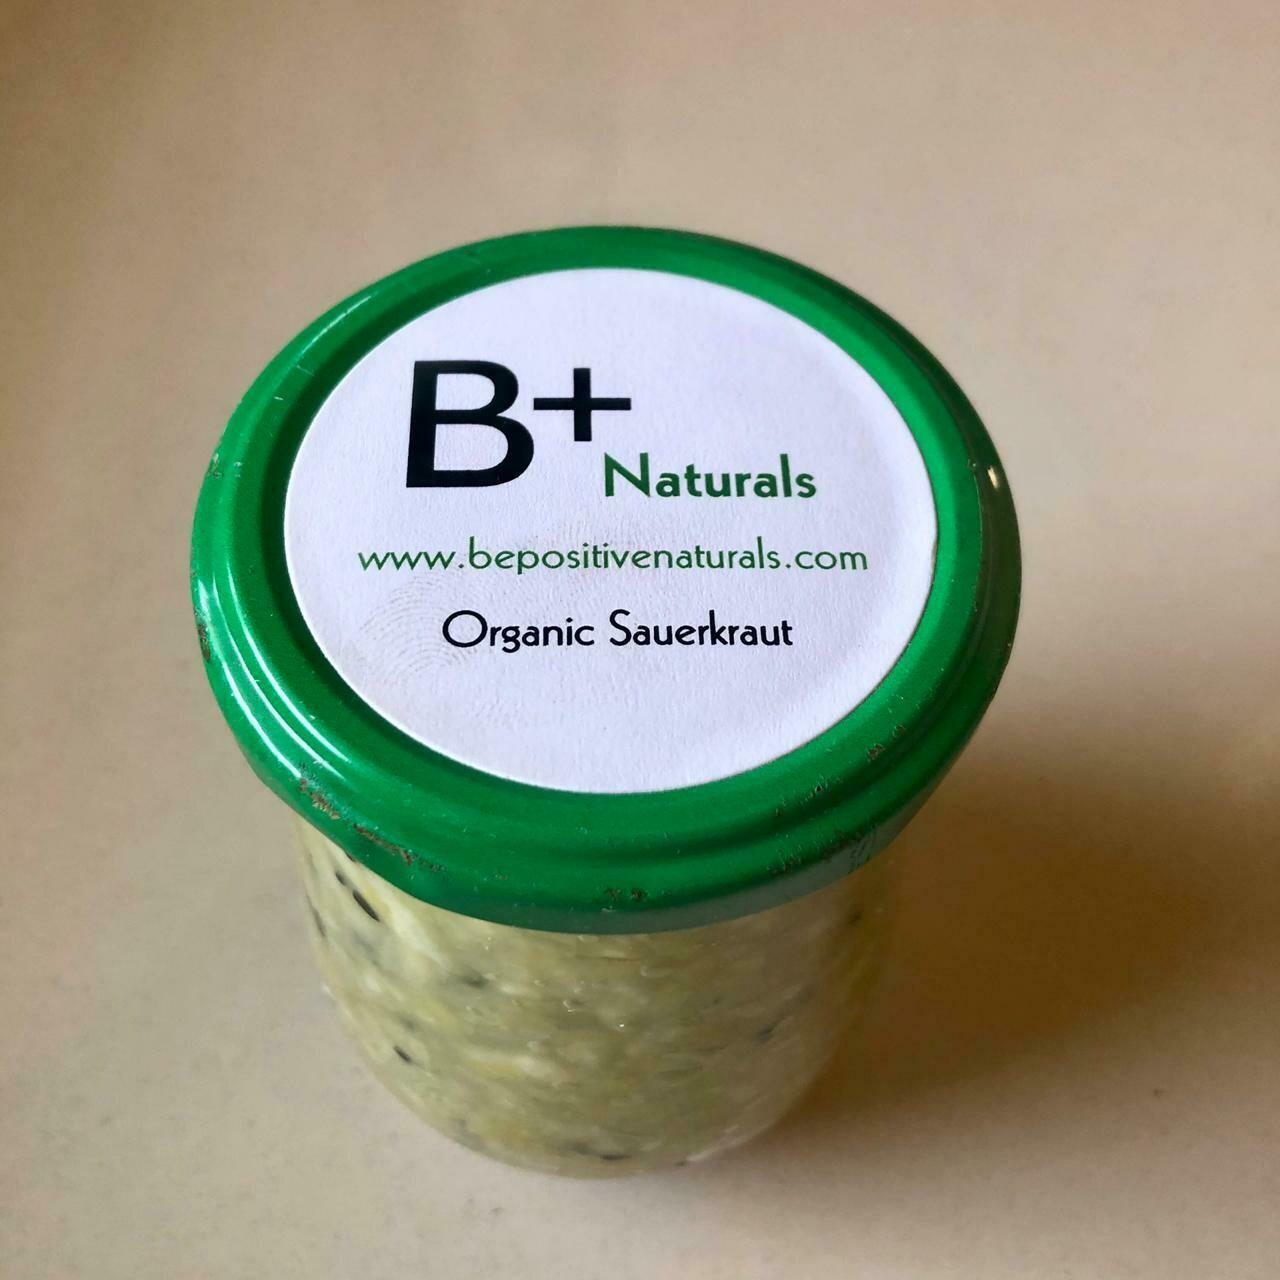 Organic Sauerkraut - 200g